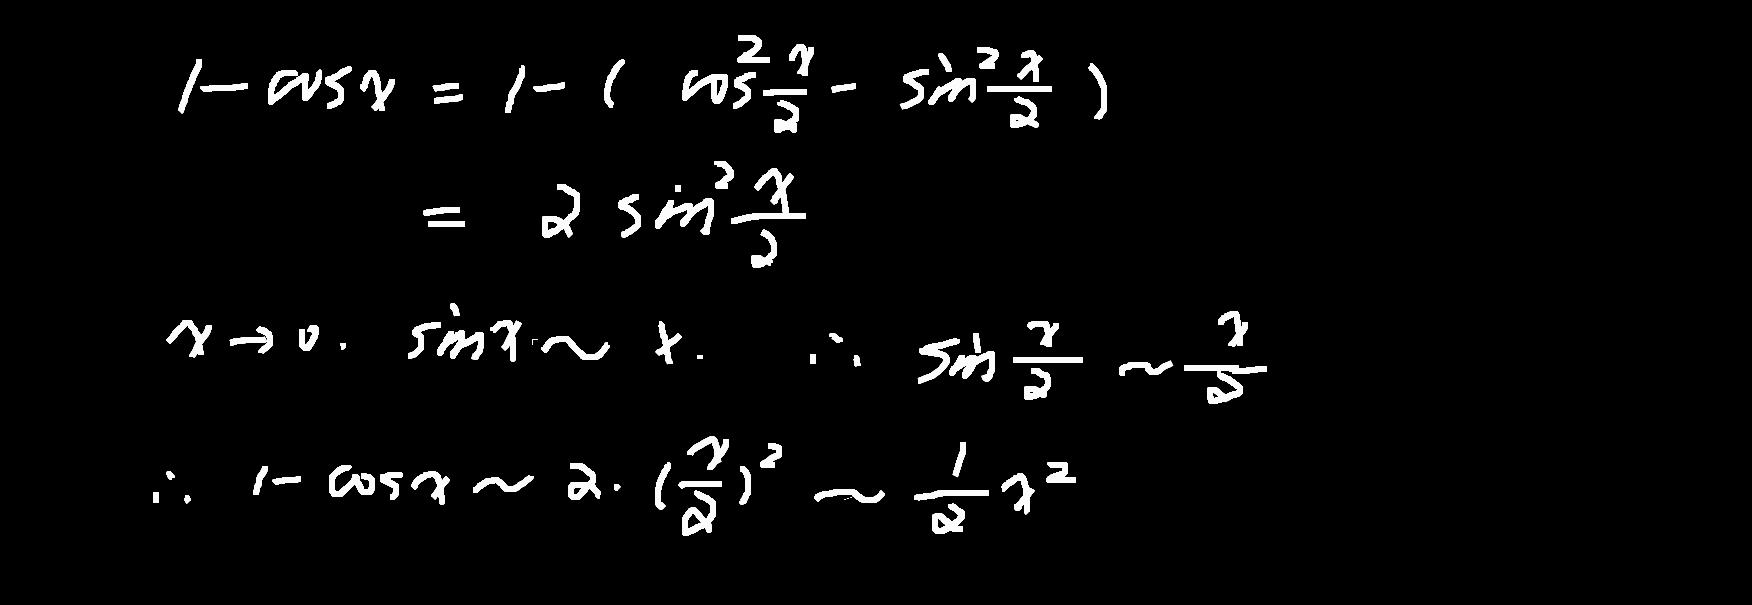 cosx≥1/2中的x的范围